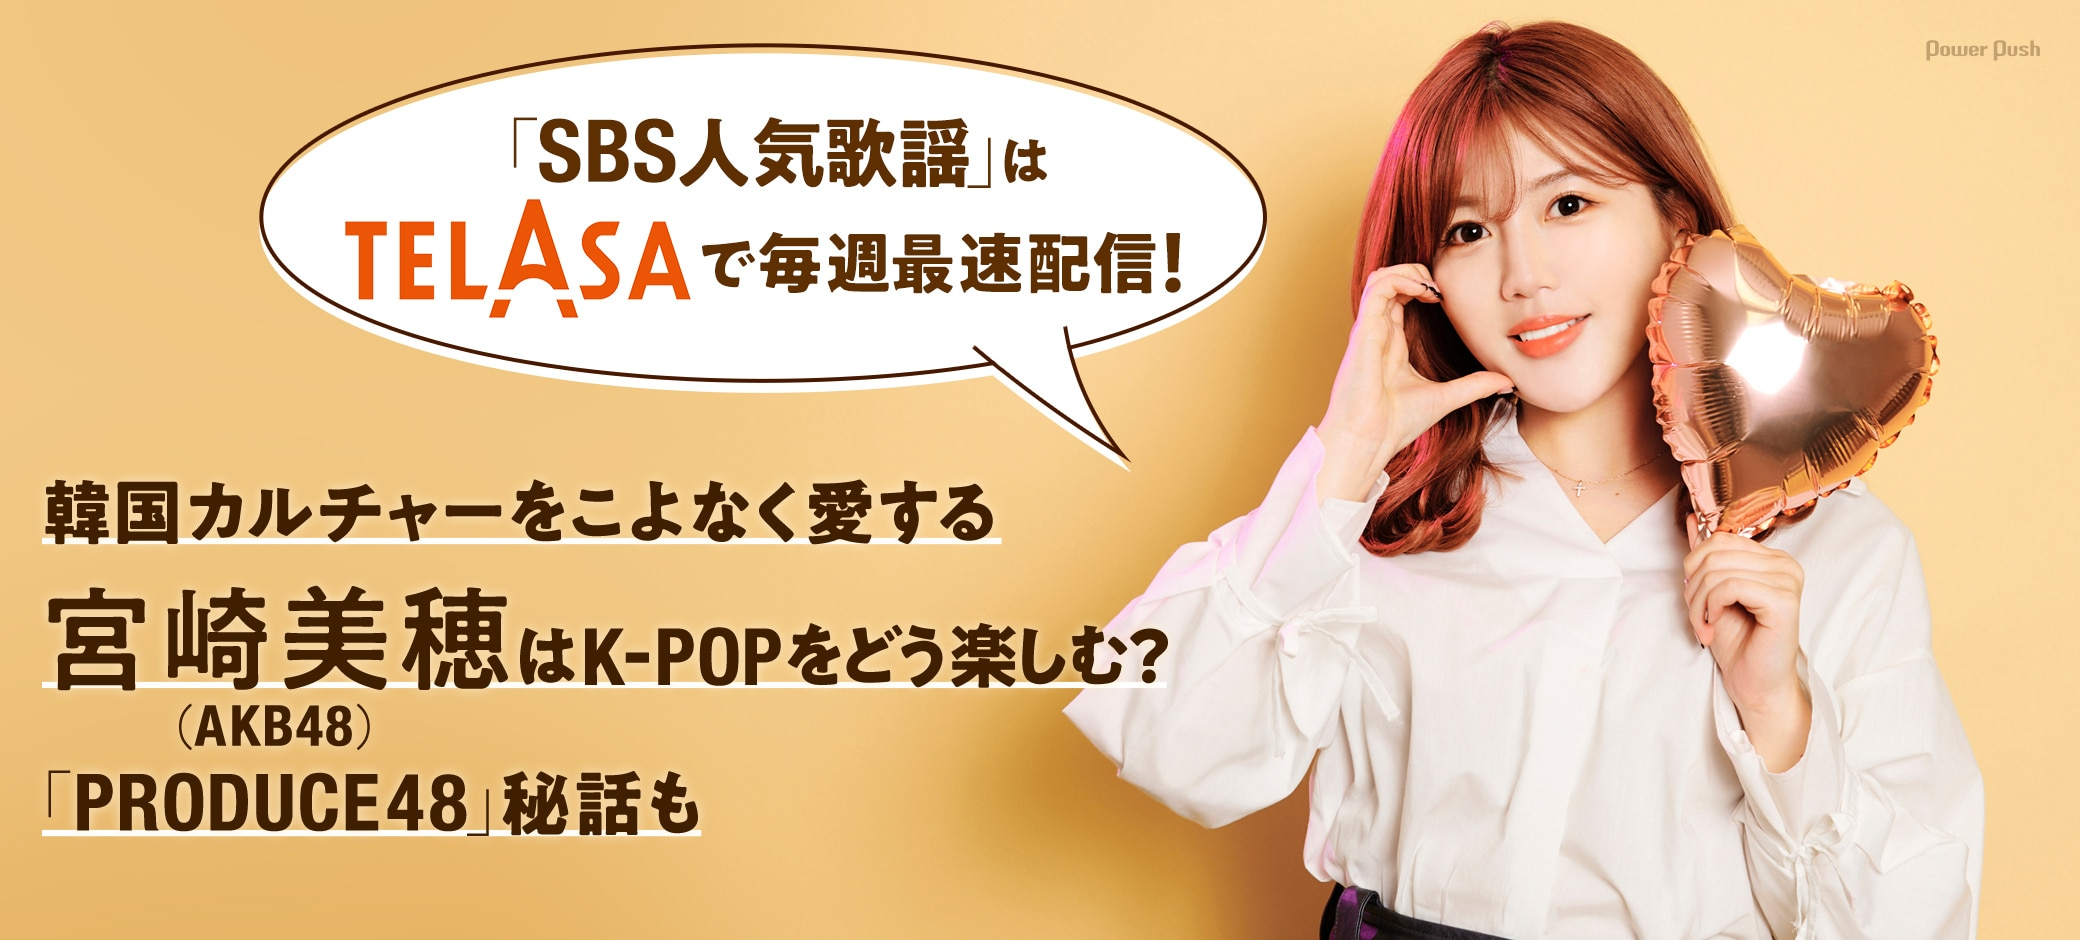 「SBS人気歌謡」はTELASAで毎週最速配信!韓国カルチャーをこよなく愛する宮崎美穂(AKB48)はK-POPをどう楽しむ?「PRODUCE48」秘話も